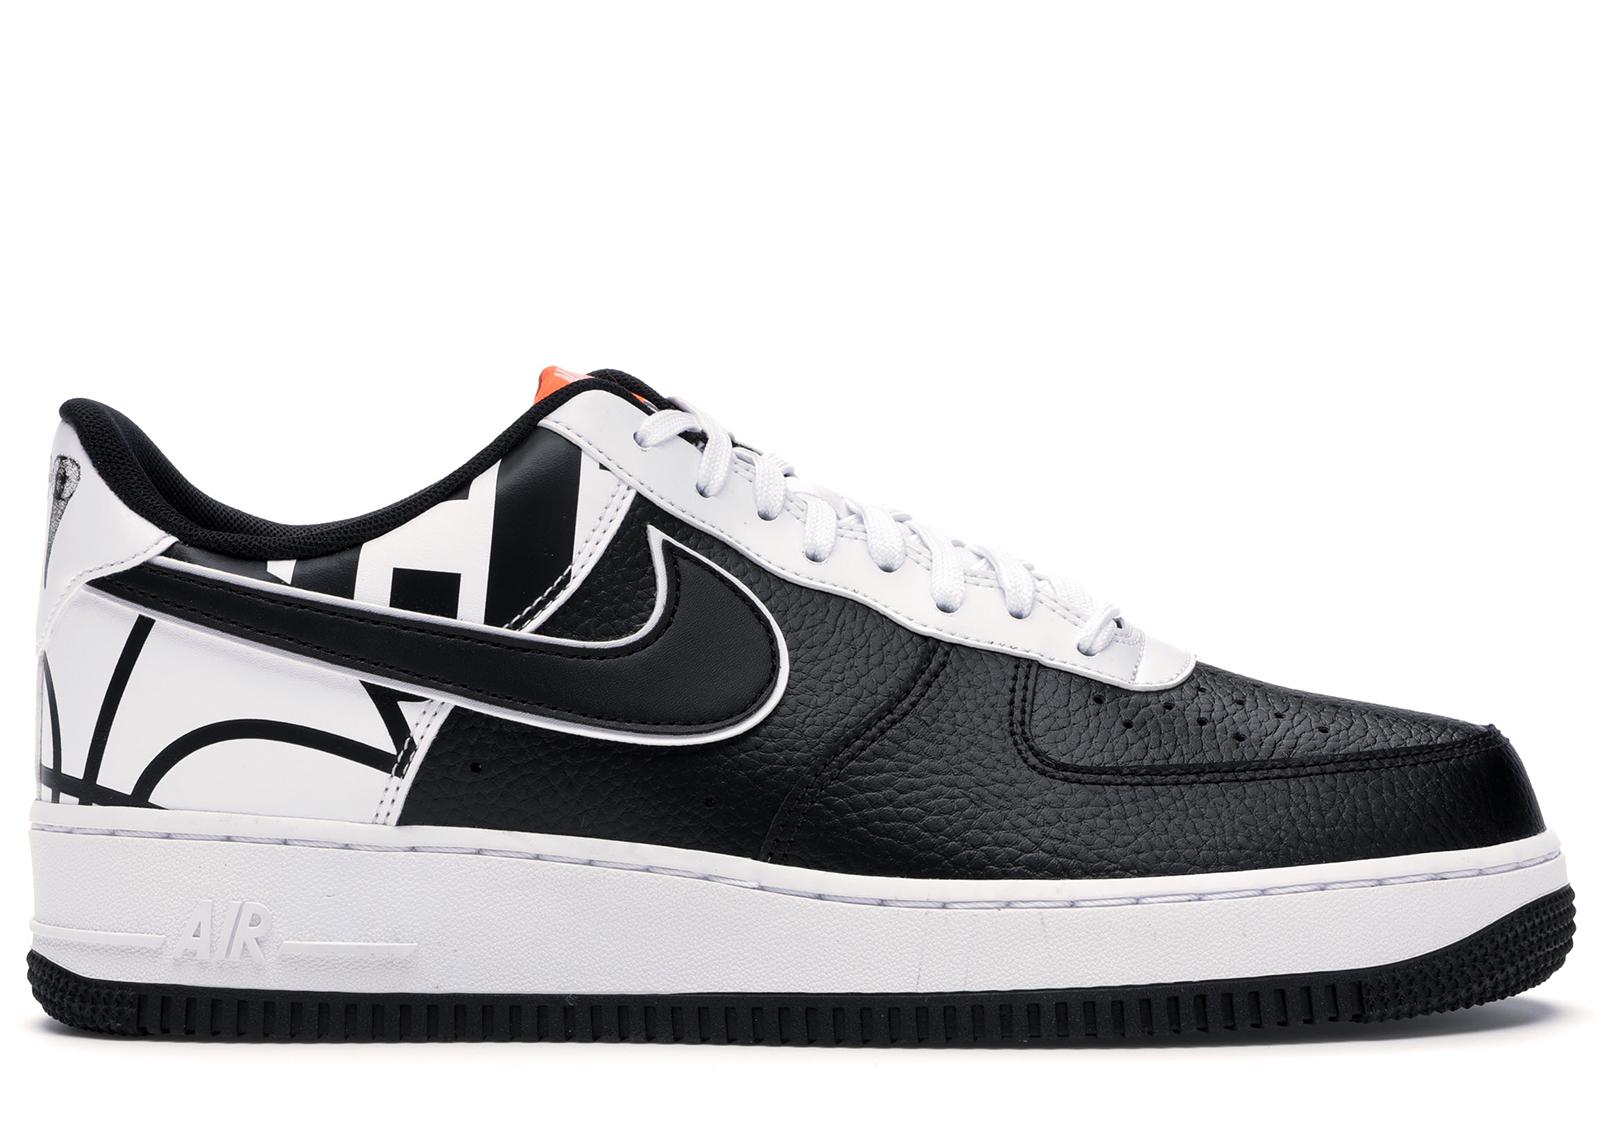 Nike Air Force 1 07 LV8 Black Black